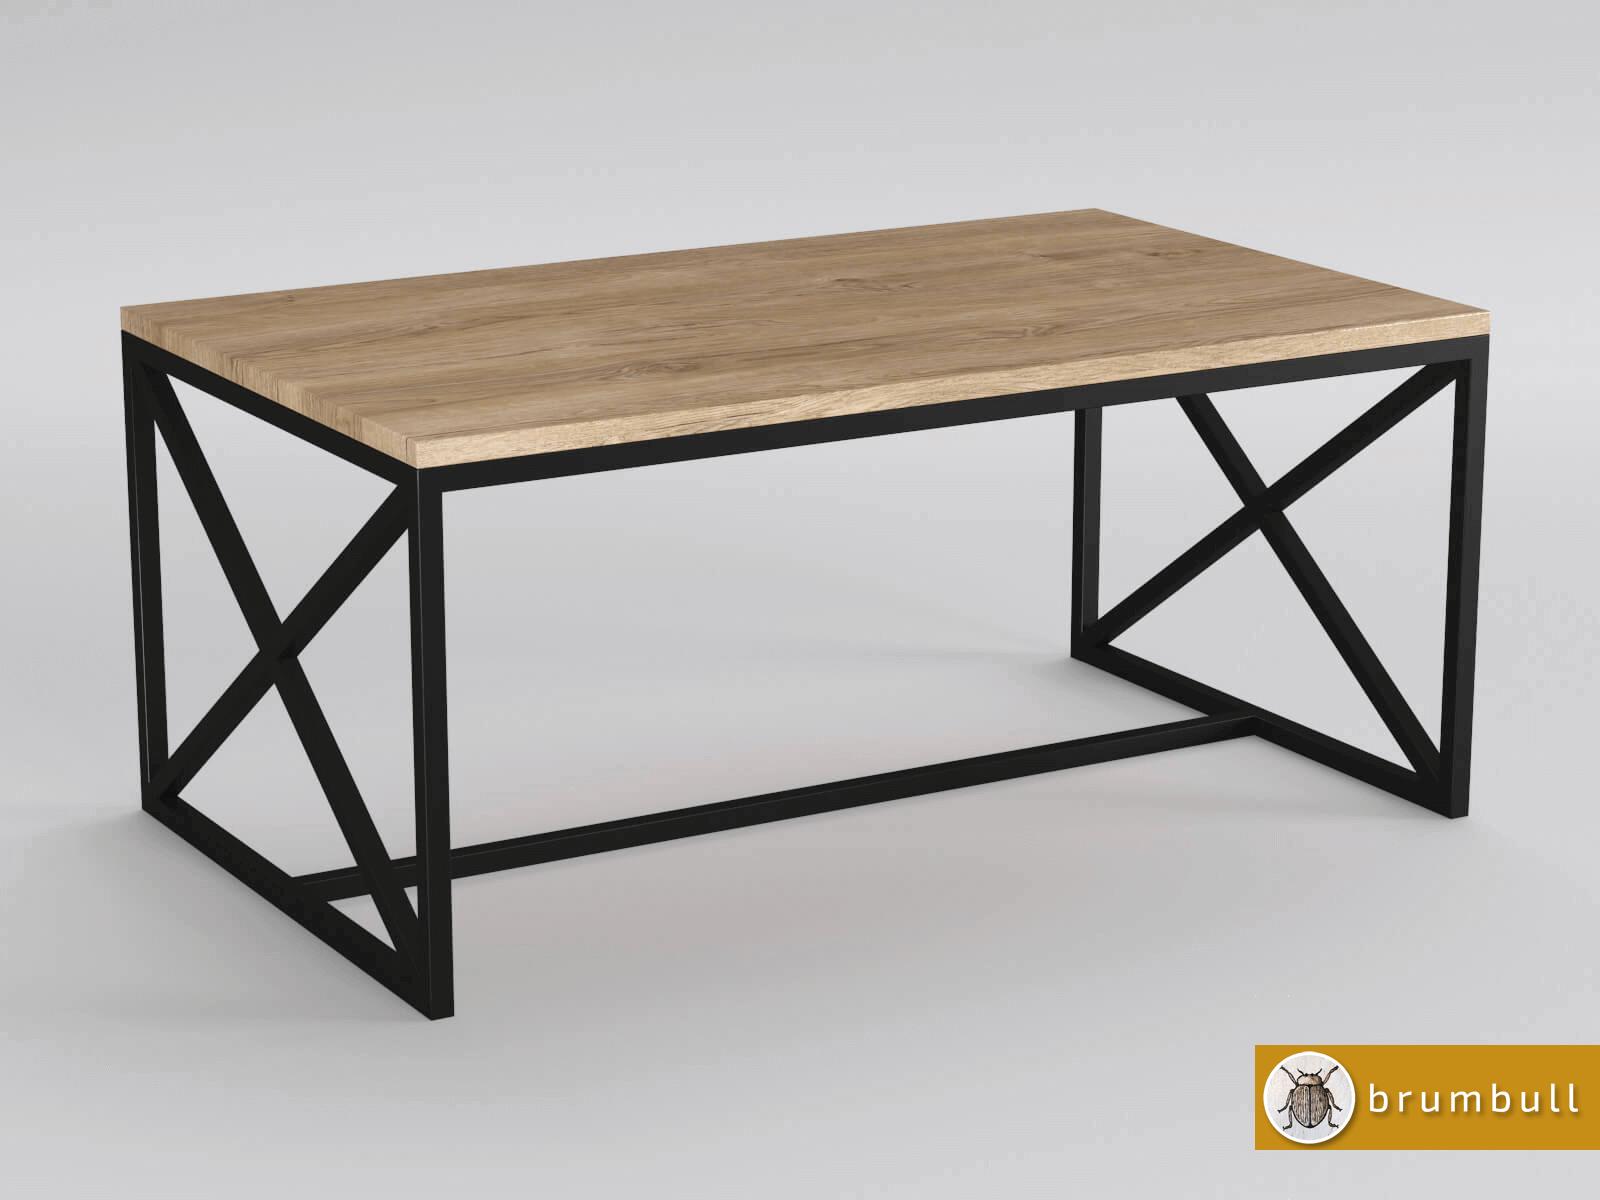 aa2c93344e79215f9fd180cf6ff879b5 Incroyable De Table Basse Ikea Avec Tiroir Concept